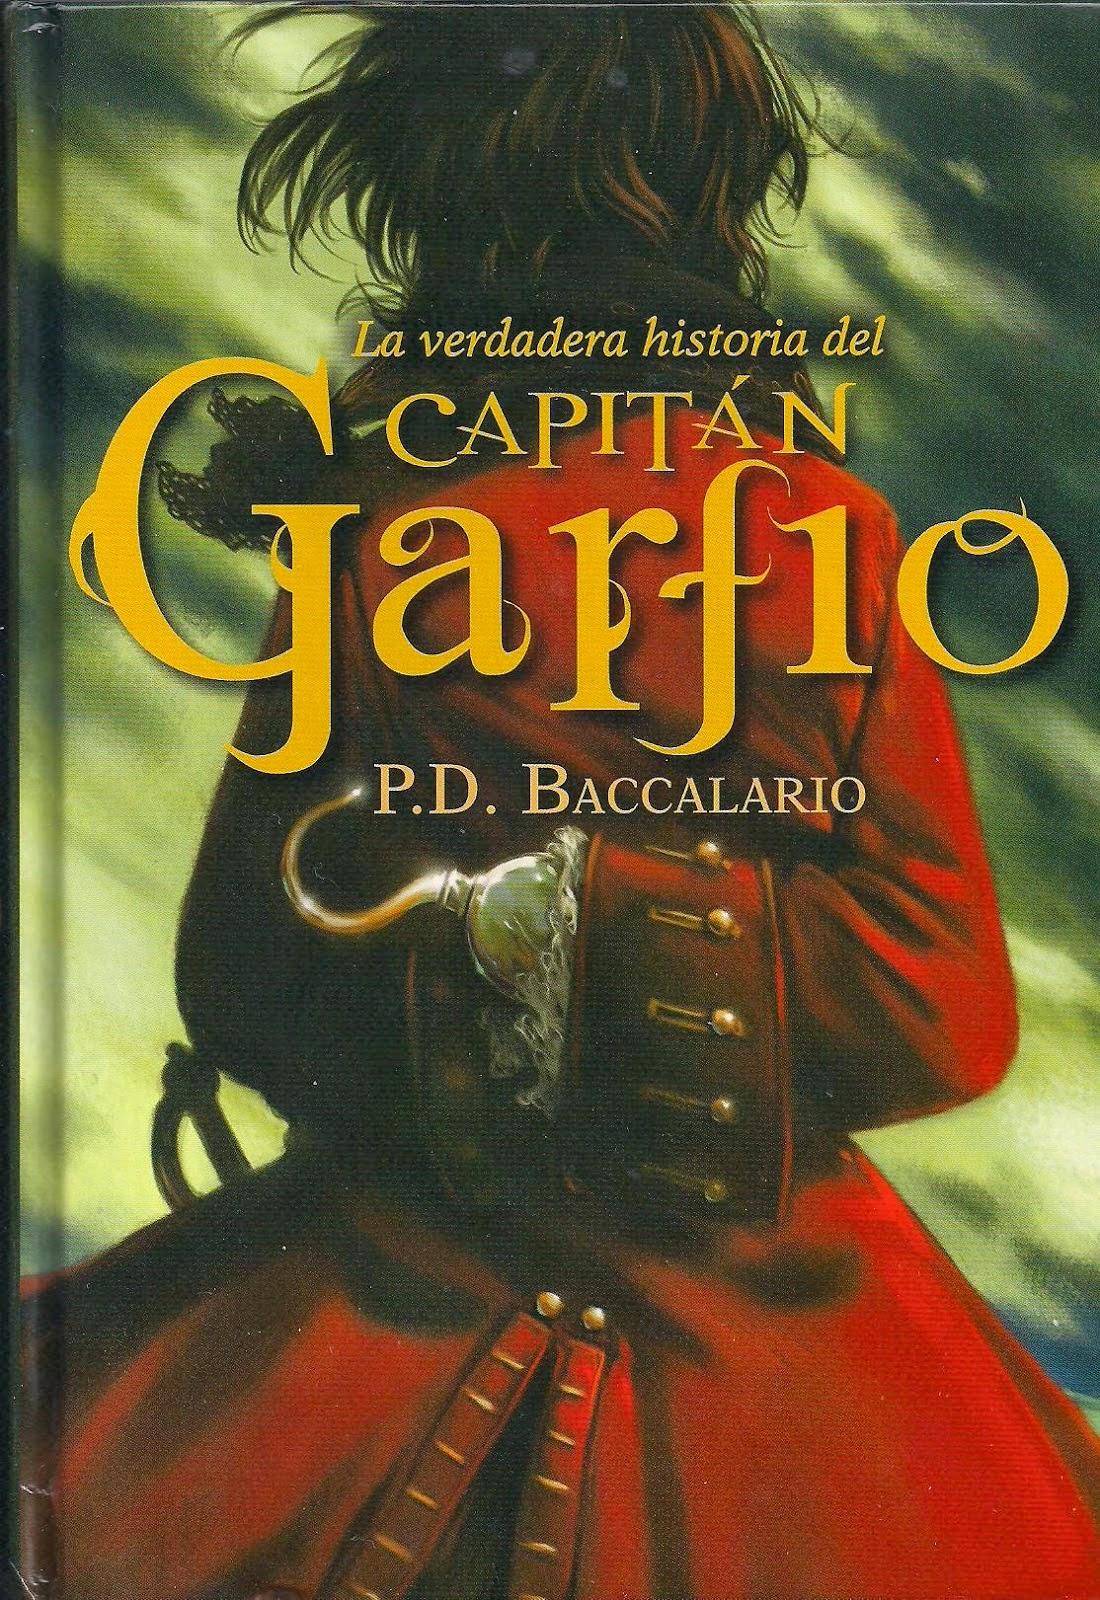 http://yerathelbooks.blogspot.com.es/2015/01/resena-libro-51-la-verdadera-historia.html